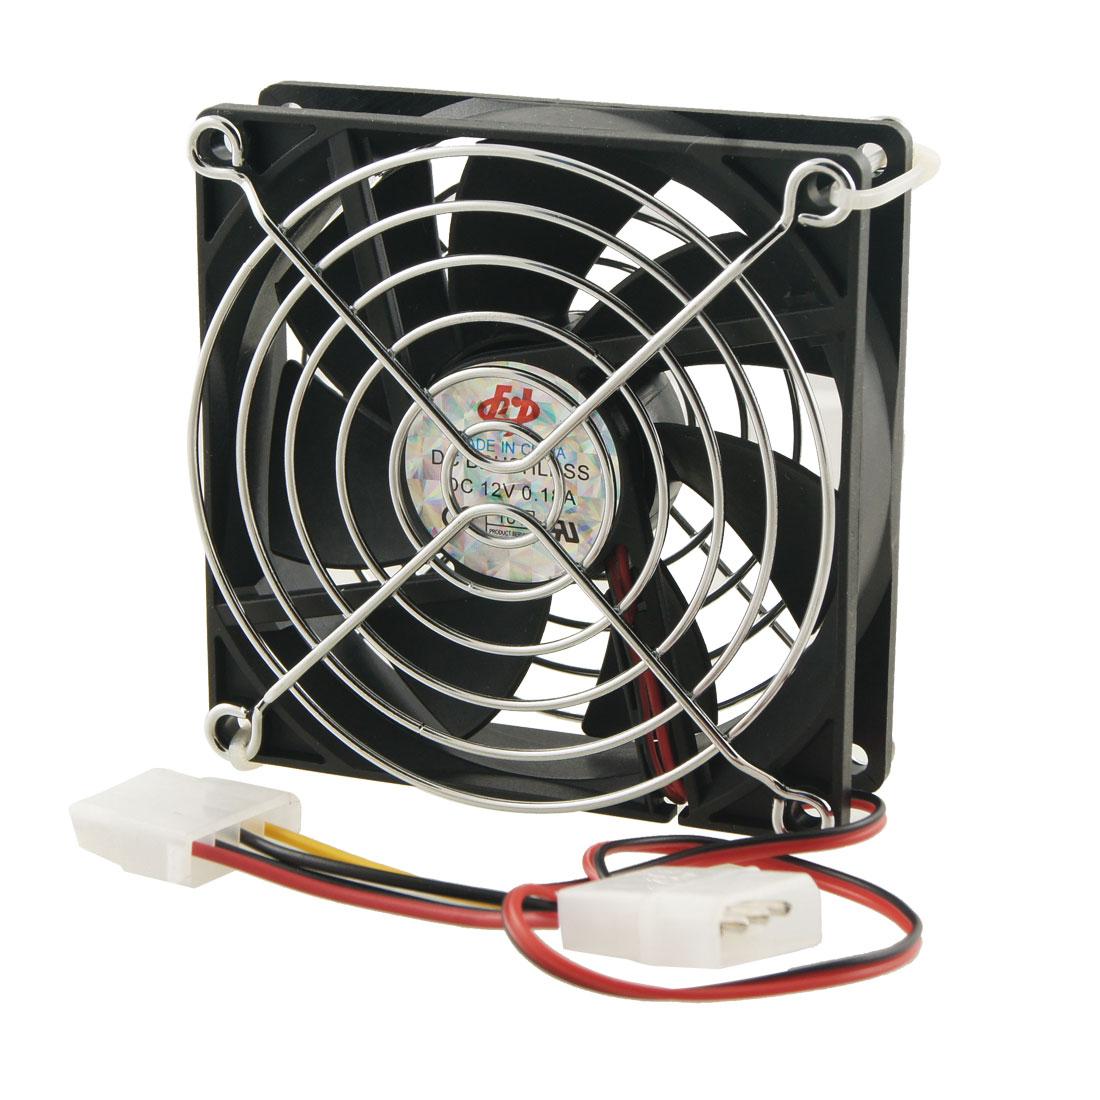 90mm x 90mm x 25mm 4 Pins Cooling Fan w Metal Finger Guards